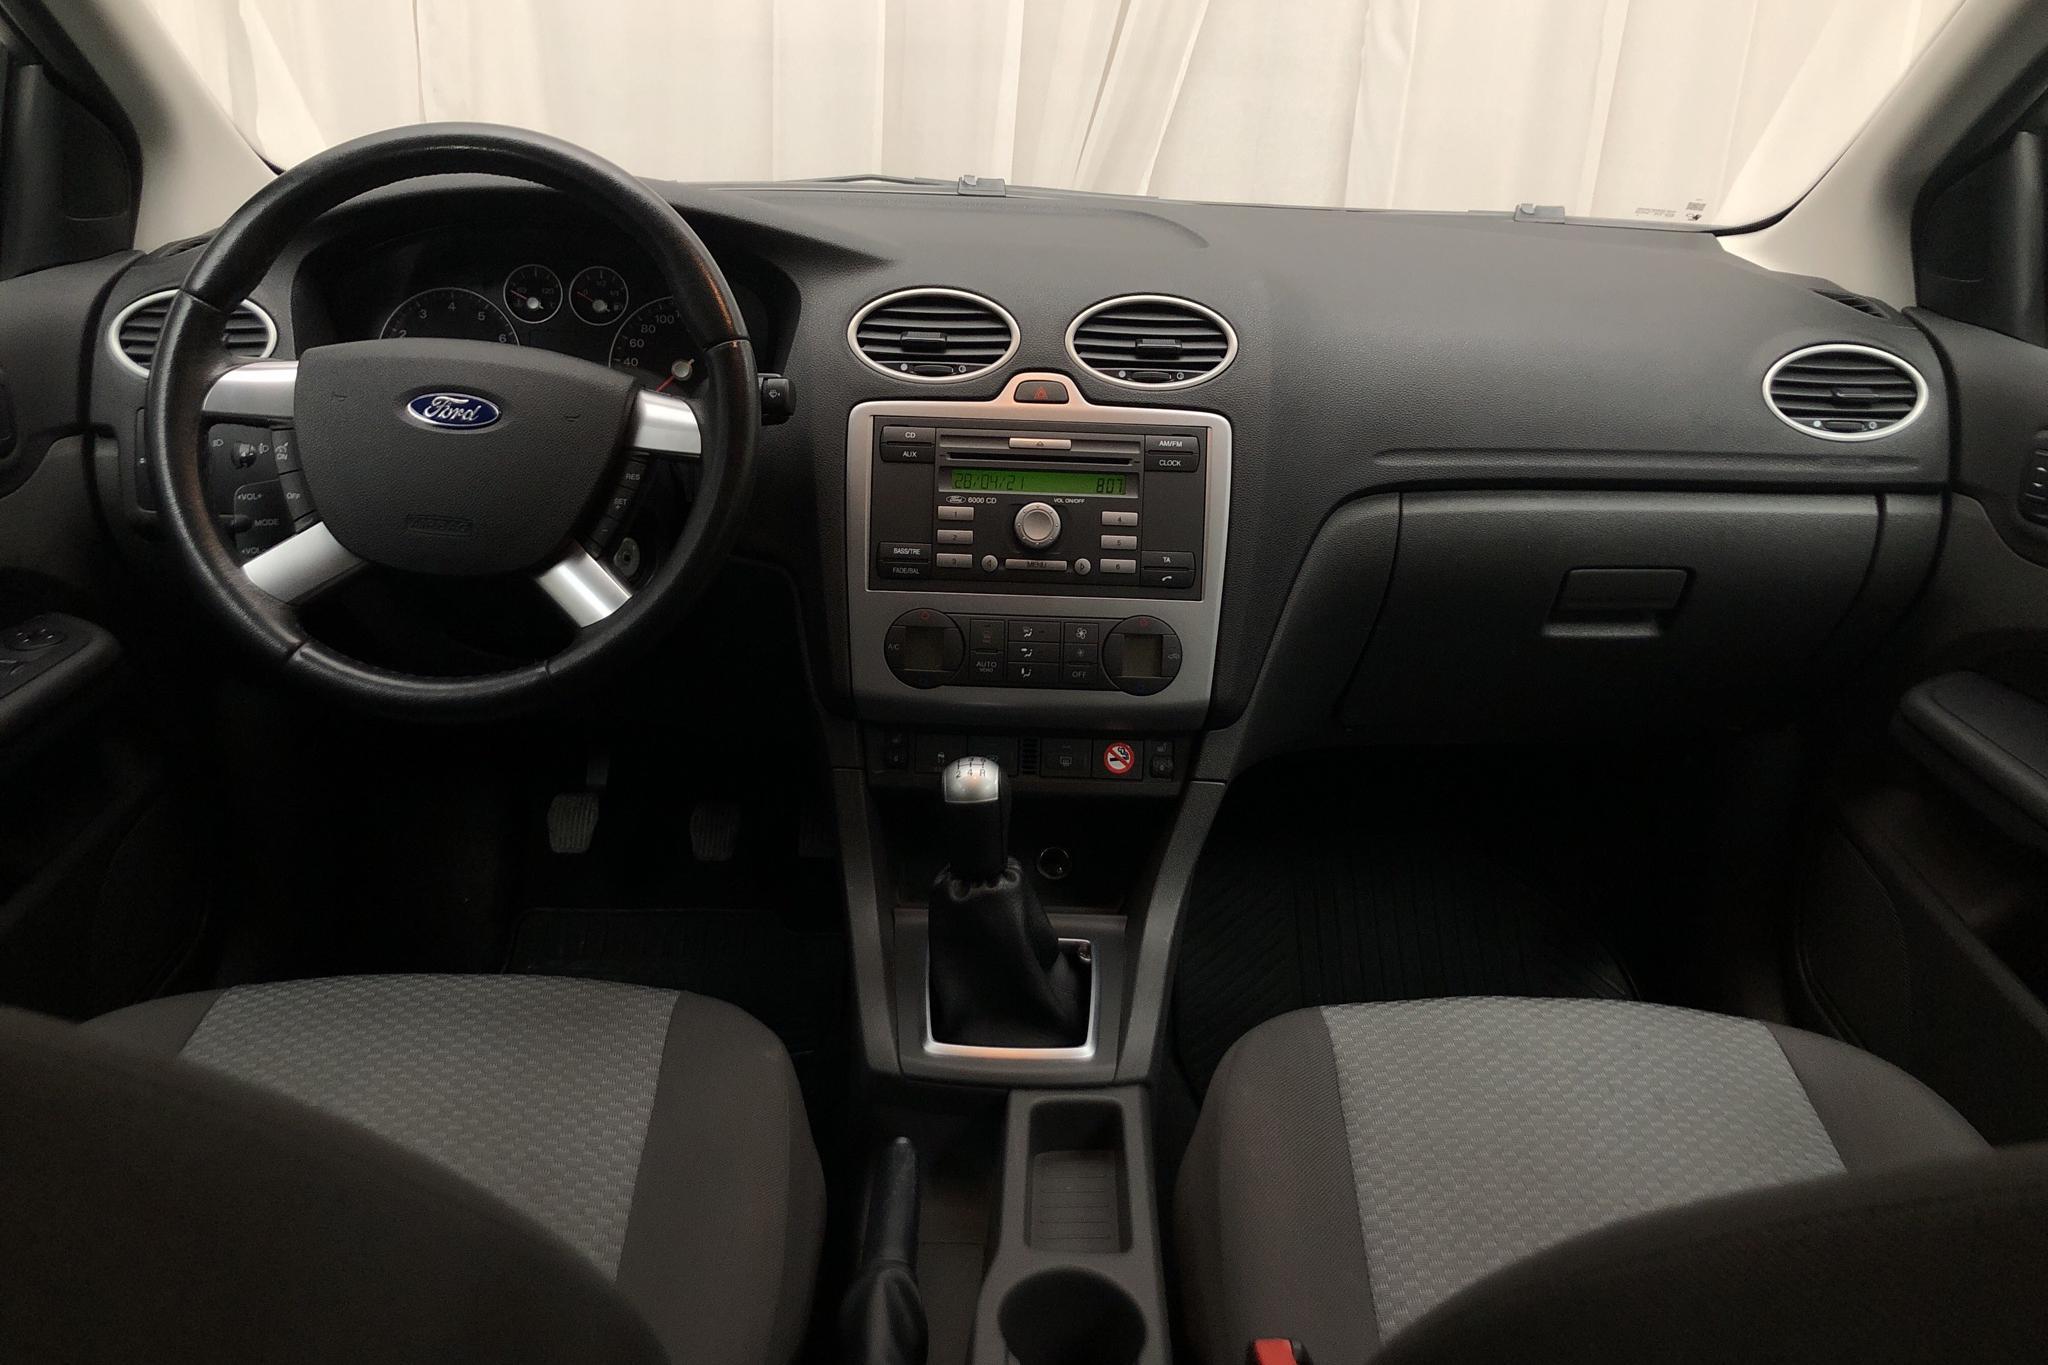 Ford Focus 1.8 Flexifuel 5dr (125hk) - 136 730 km - Manual - blue - 2006